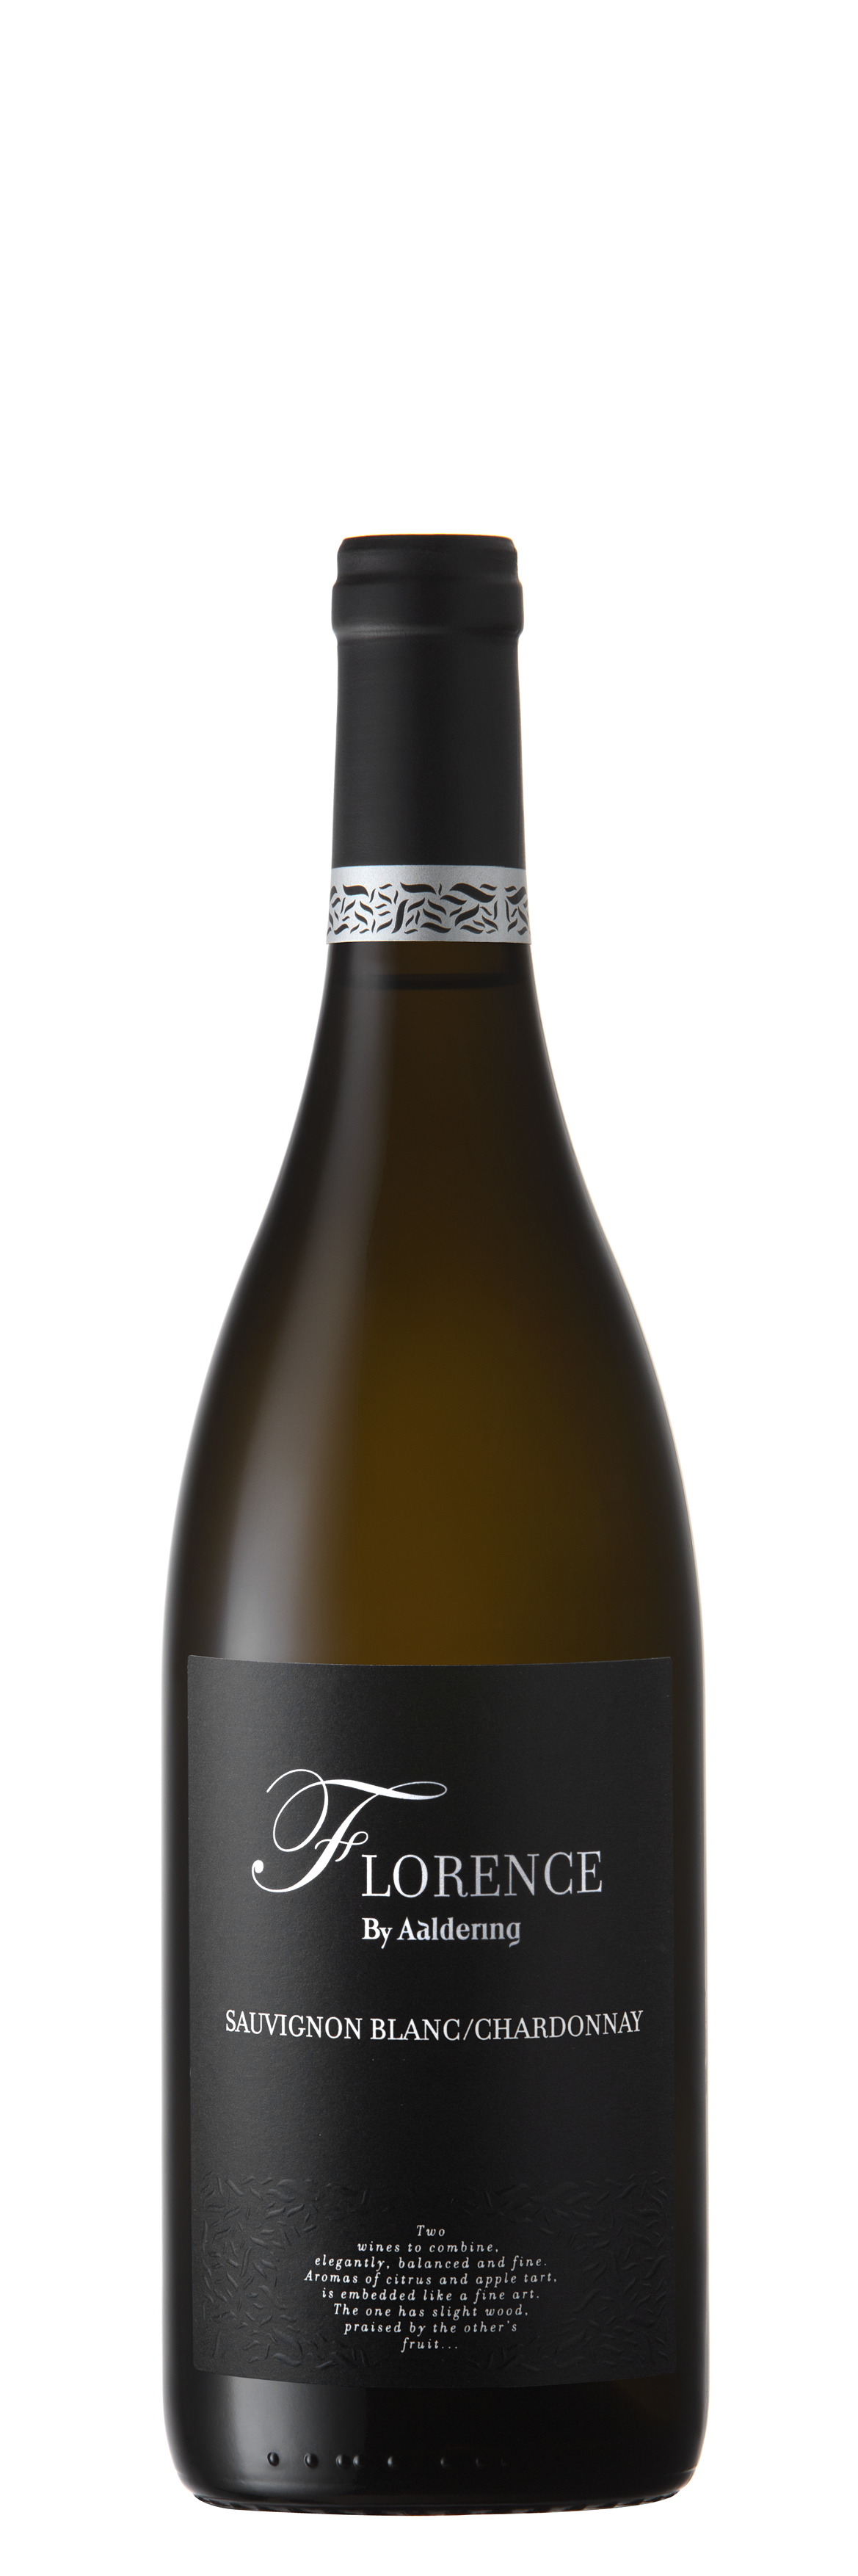 Aaldering Florence Sauvignon Blanc - Chardonnay 2020